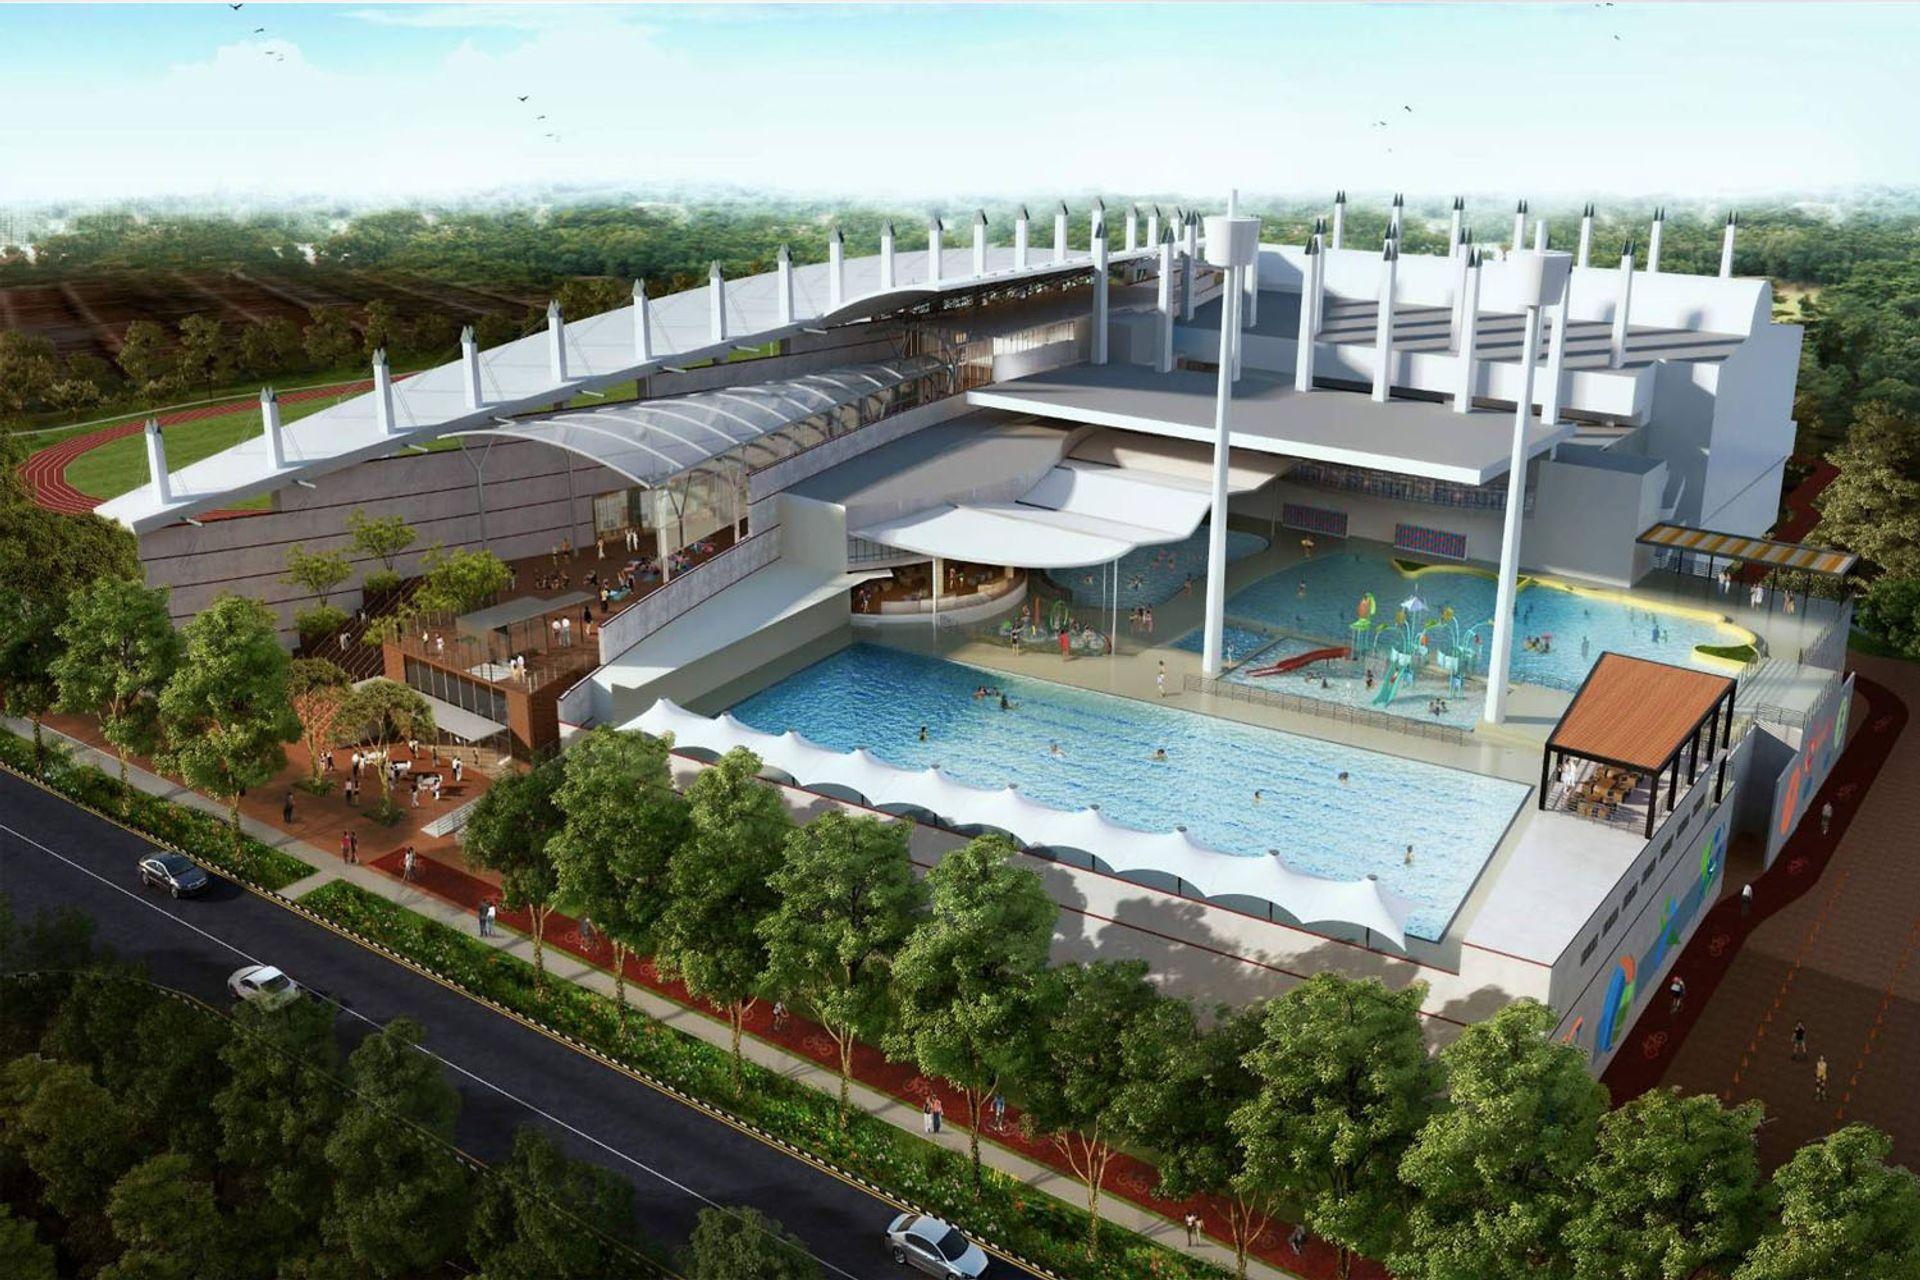 Choa Chu Kang Swimming Complex